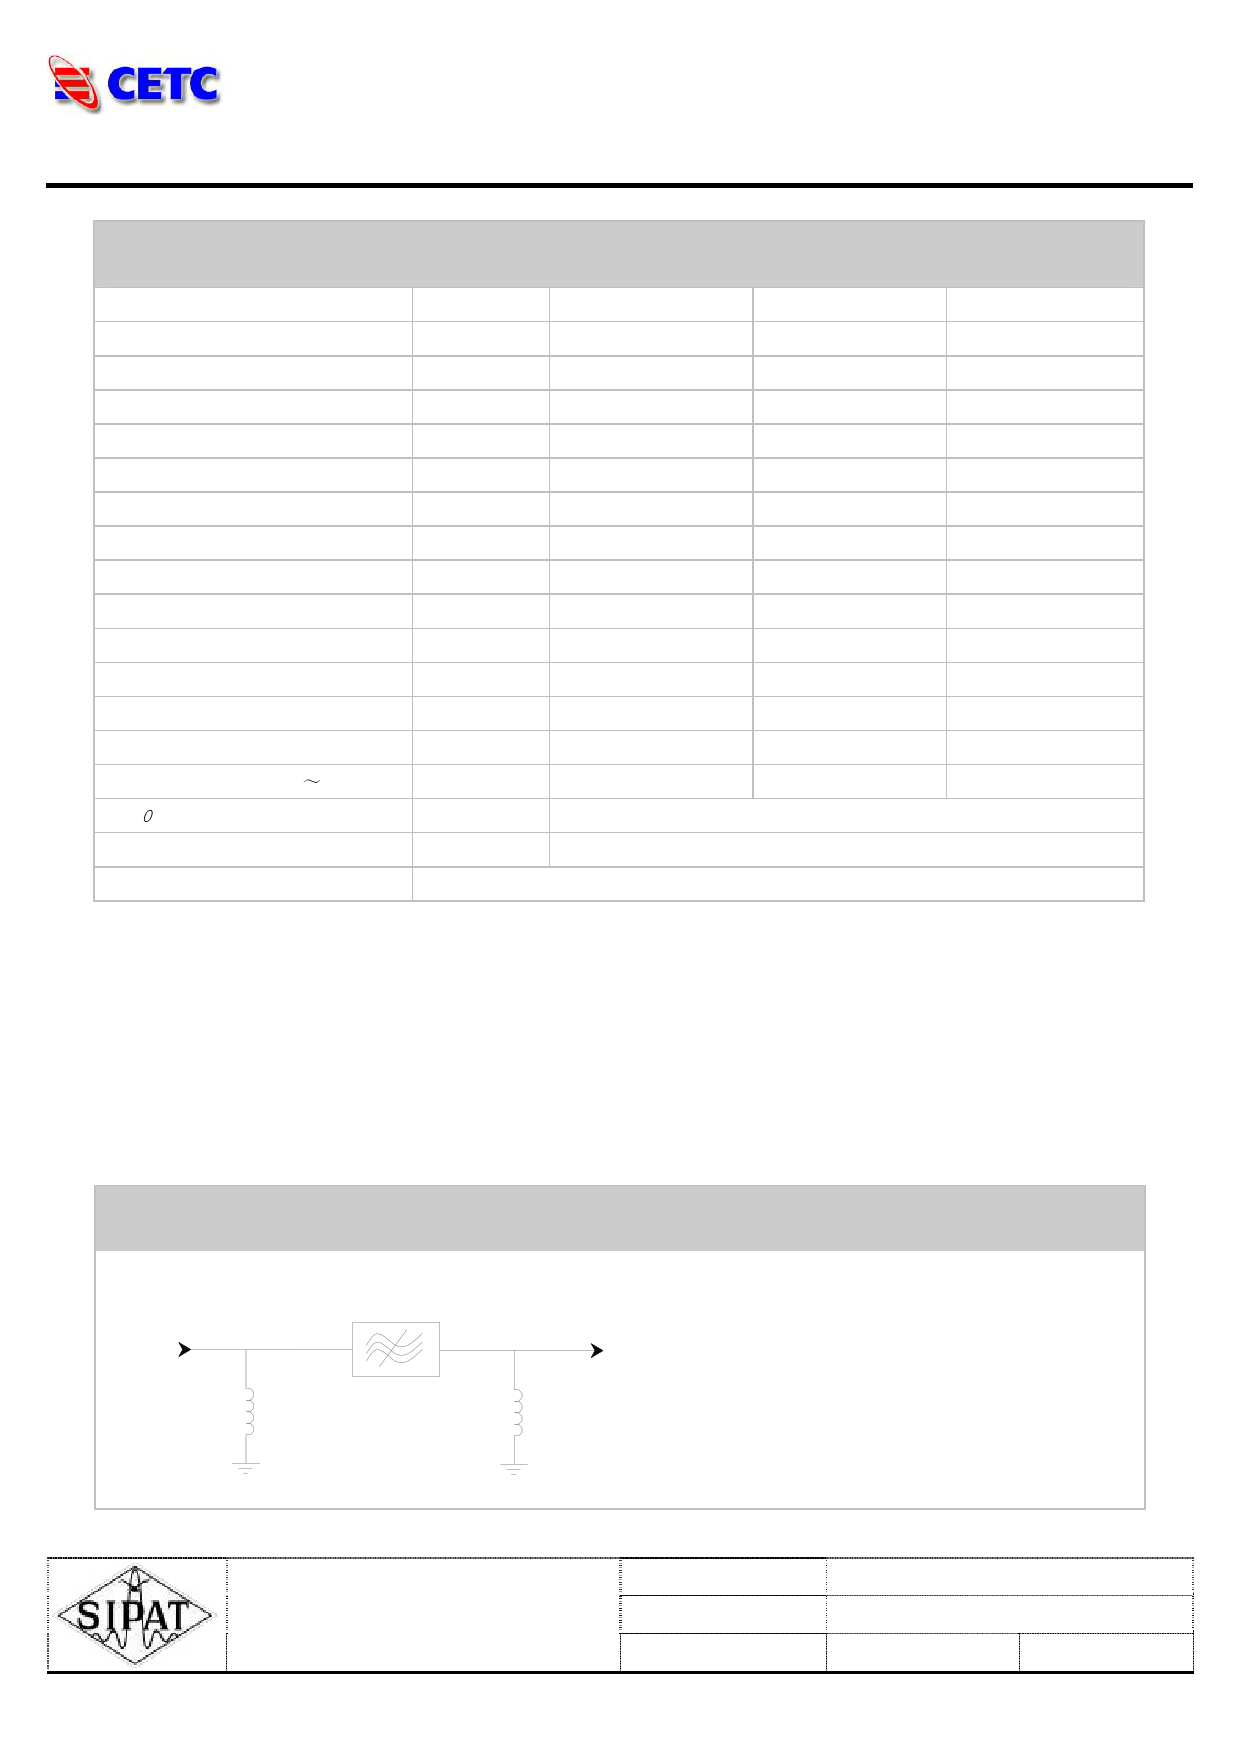 LBT14092 datasheet